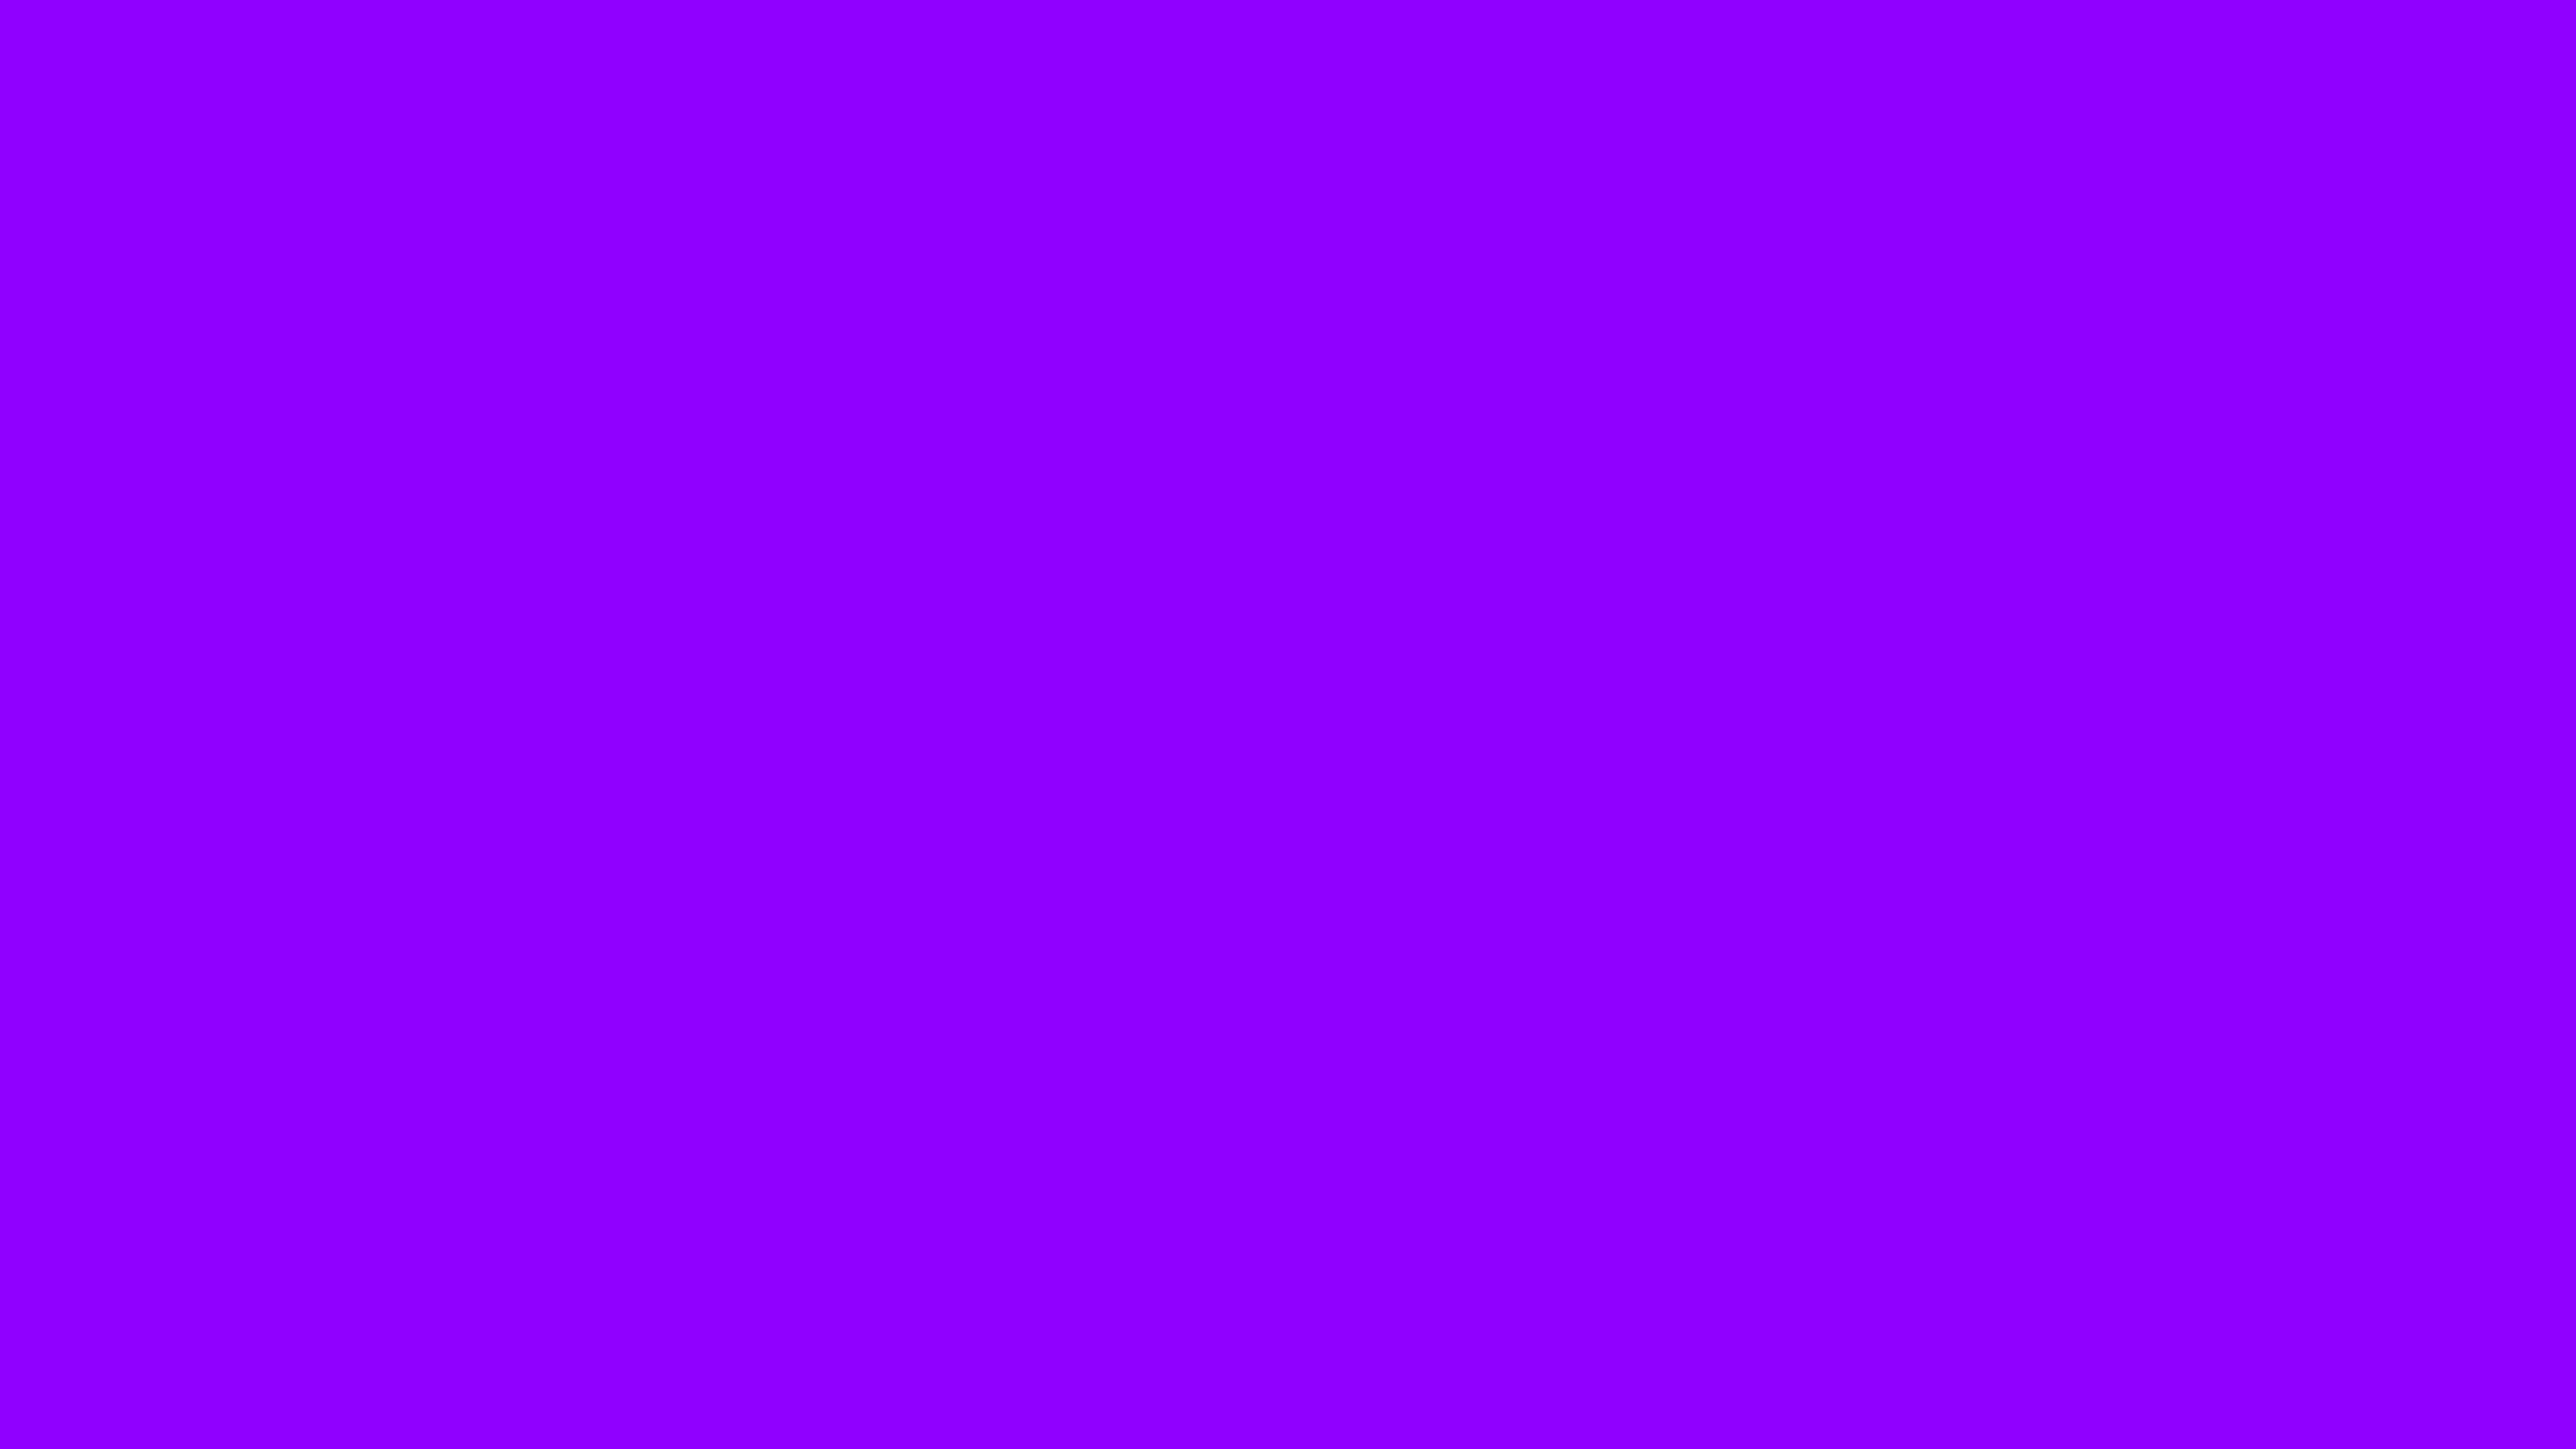 4096x2304 Electric Violet Solid Color Background